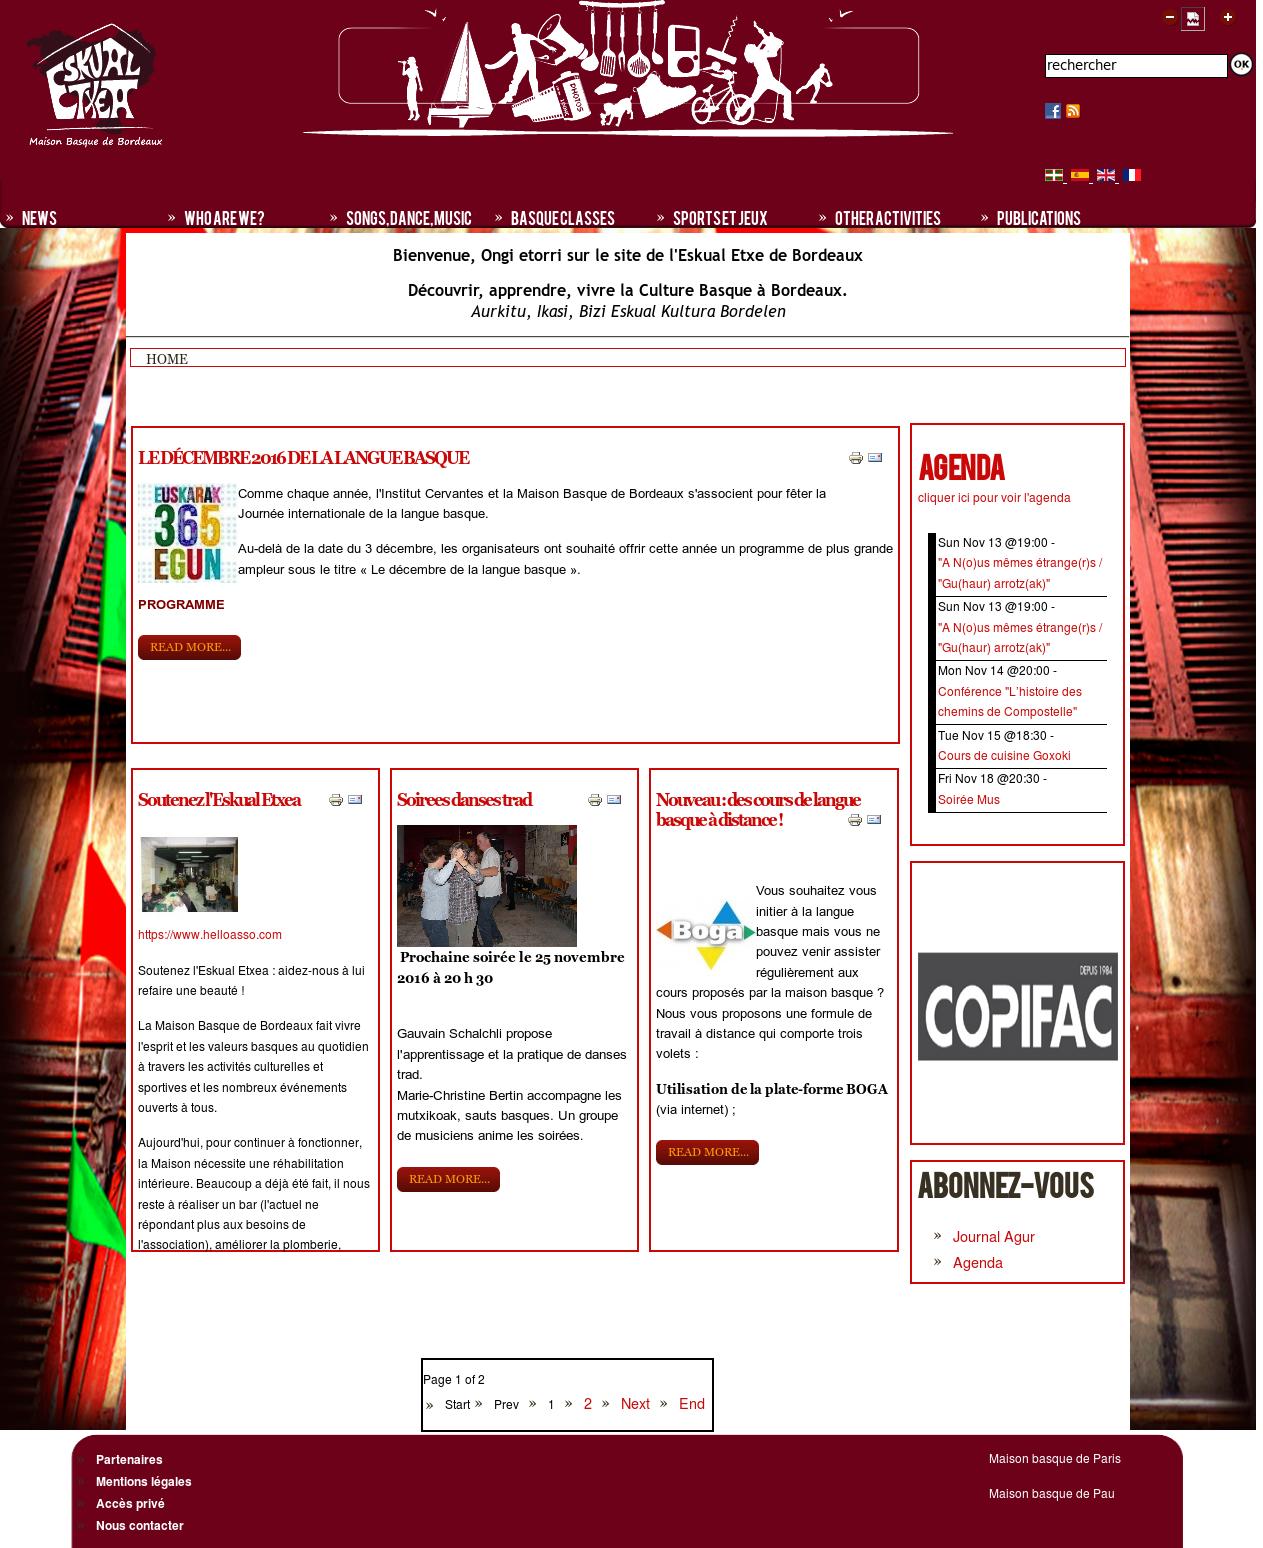 Bordeleko Eskual Etxea Maison Basque De Bordeaux S Competitors Revenue Number Of Employees Funding Acquisitions News Owler Company Profile